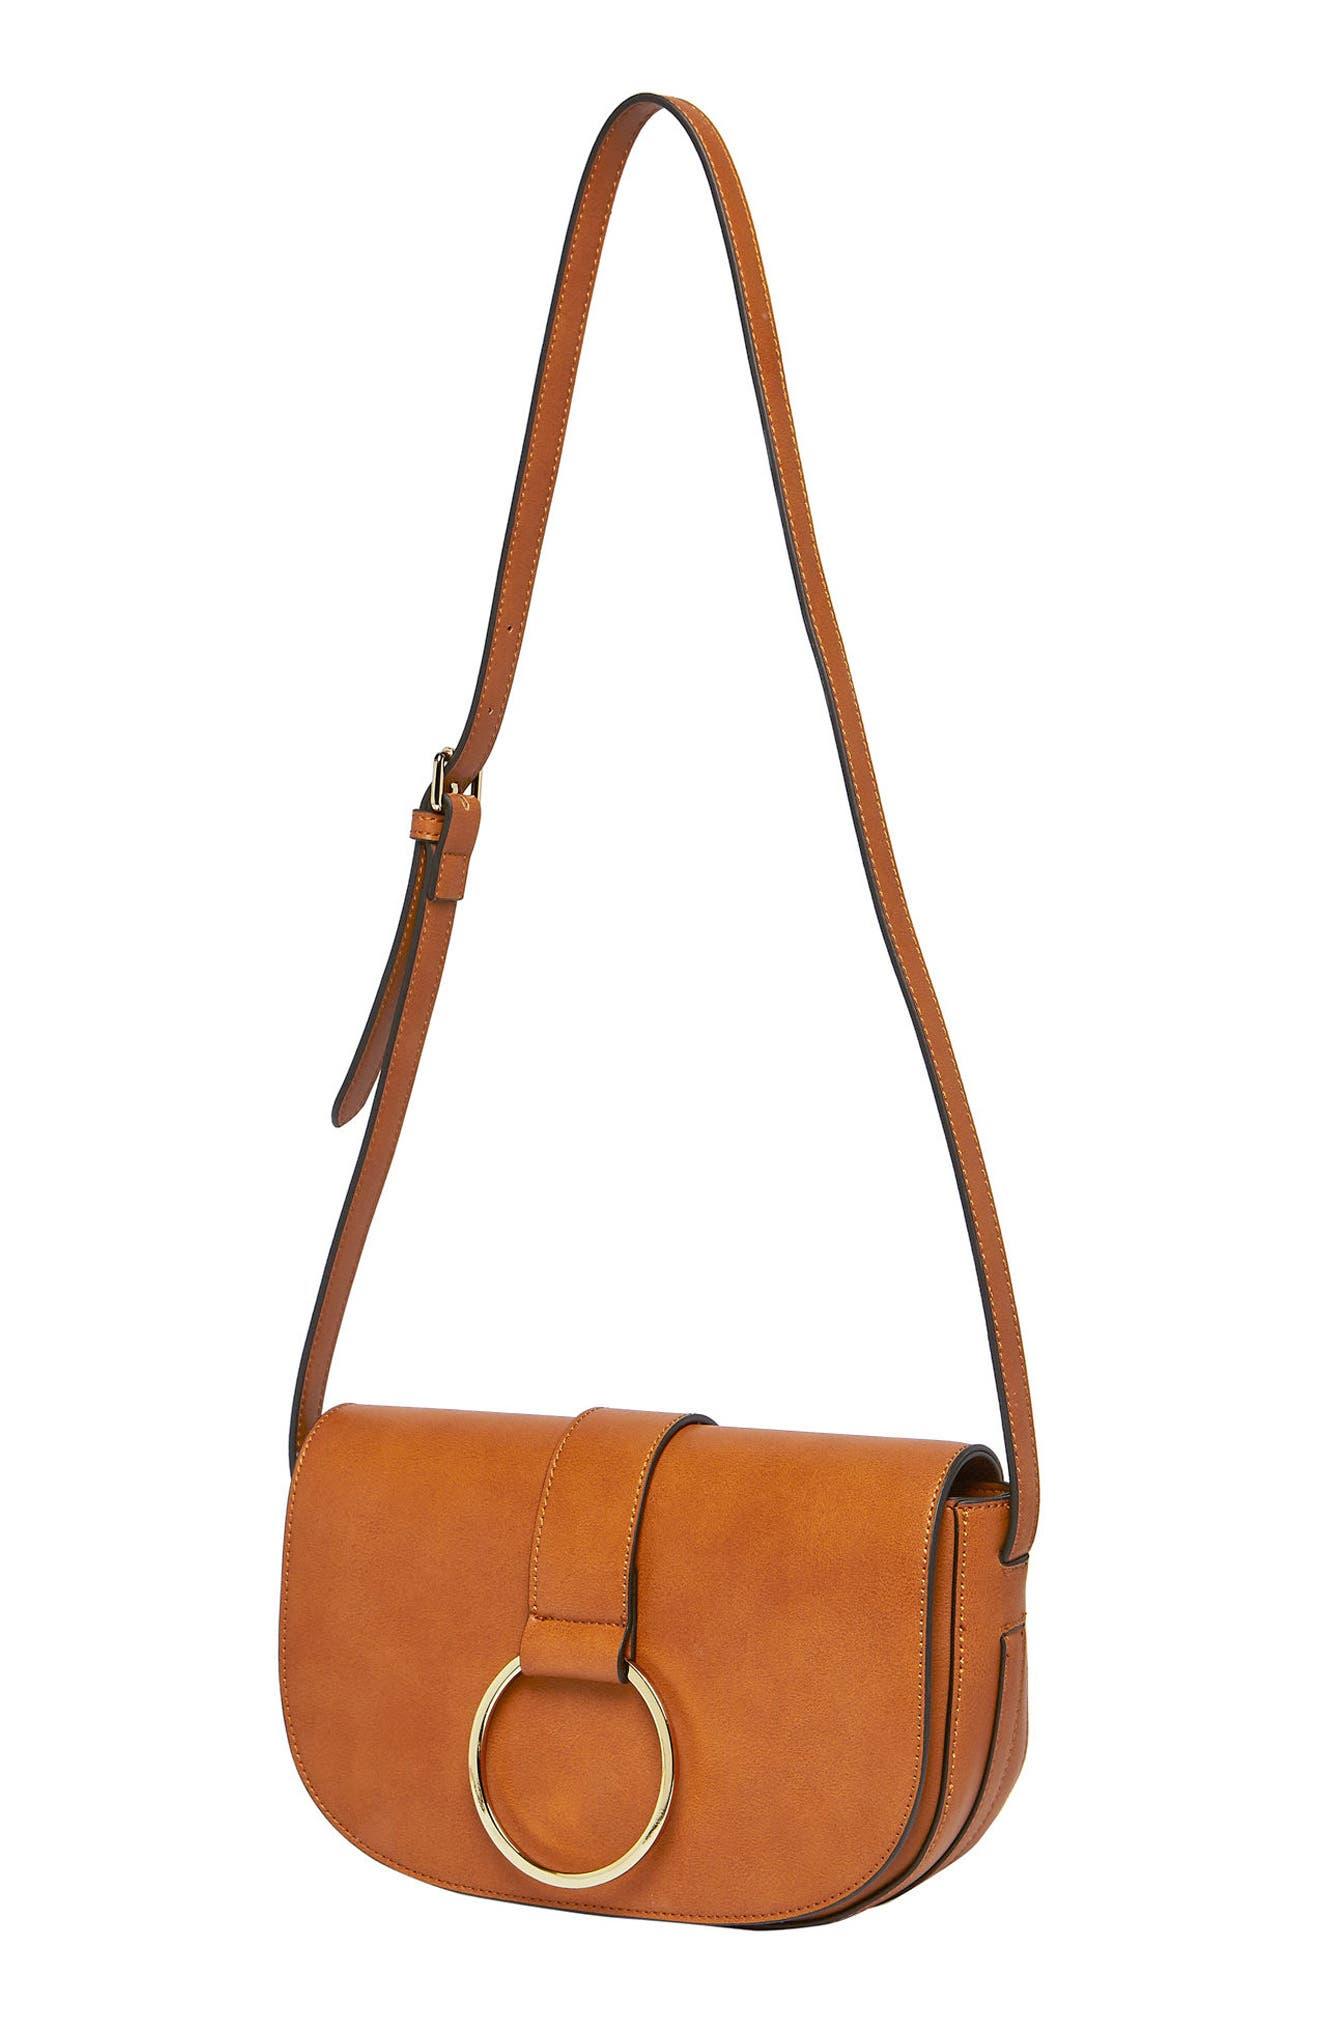 Lola Vegan Leather Crossbody Saddle Bag,                             Alternate thumbnail 3, color,                             TAN